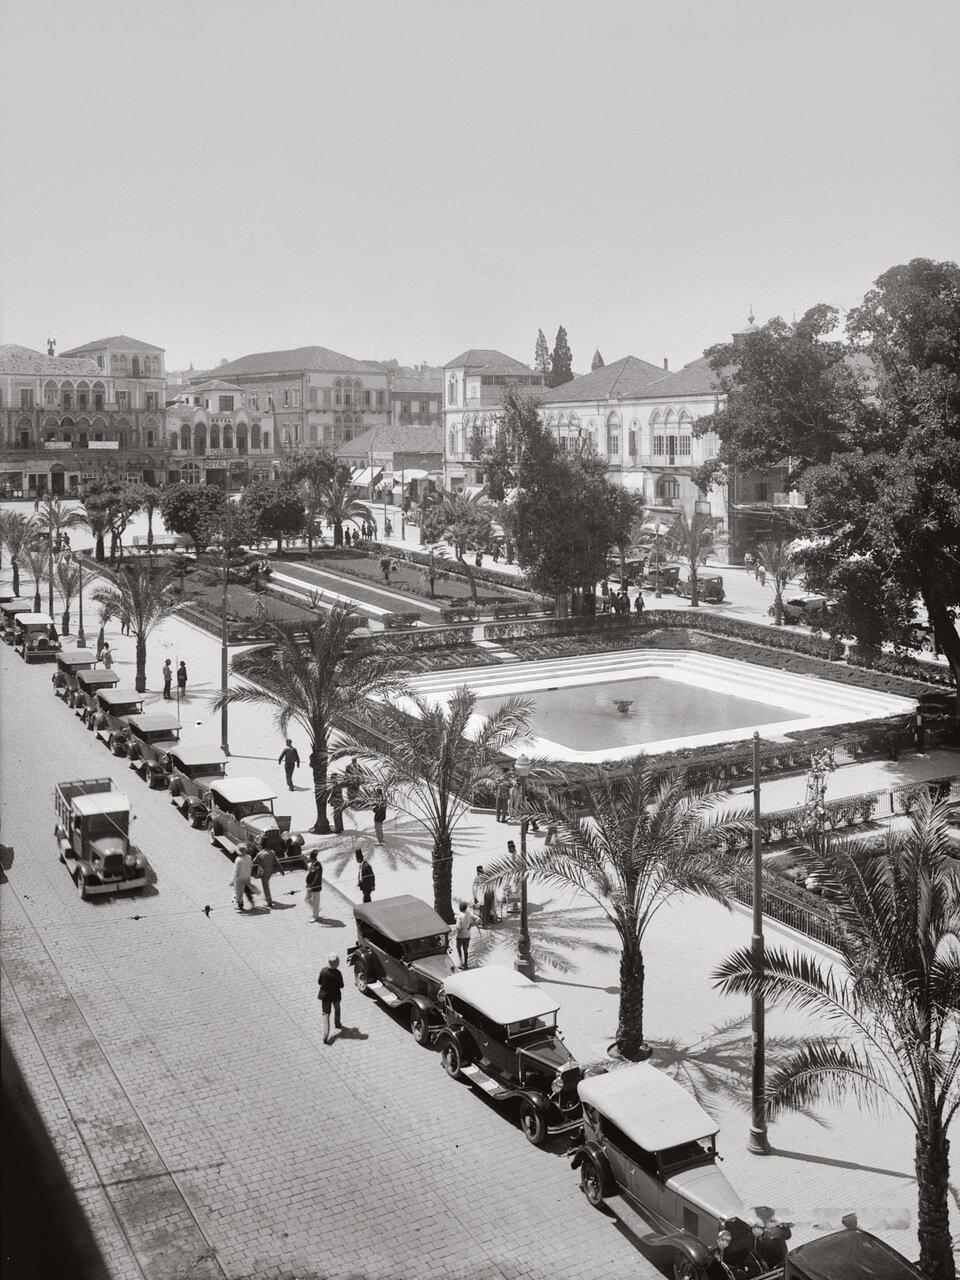 Общественный сад. Бейрут, Ливан. 1900-1920 гг.